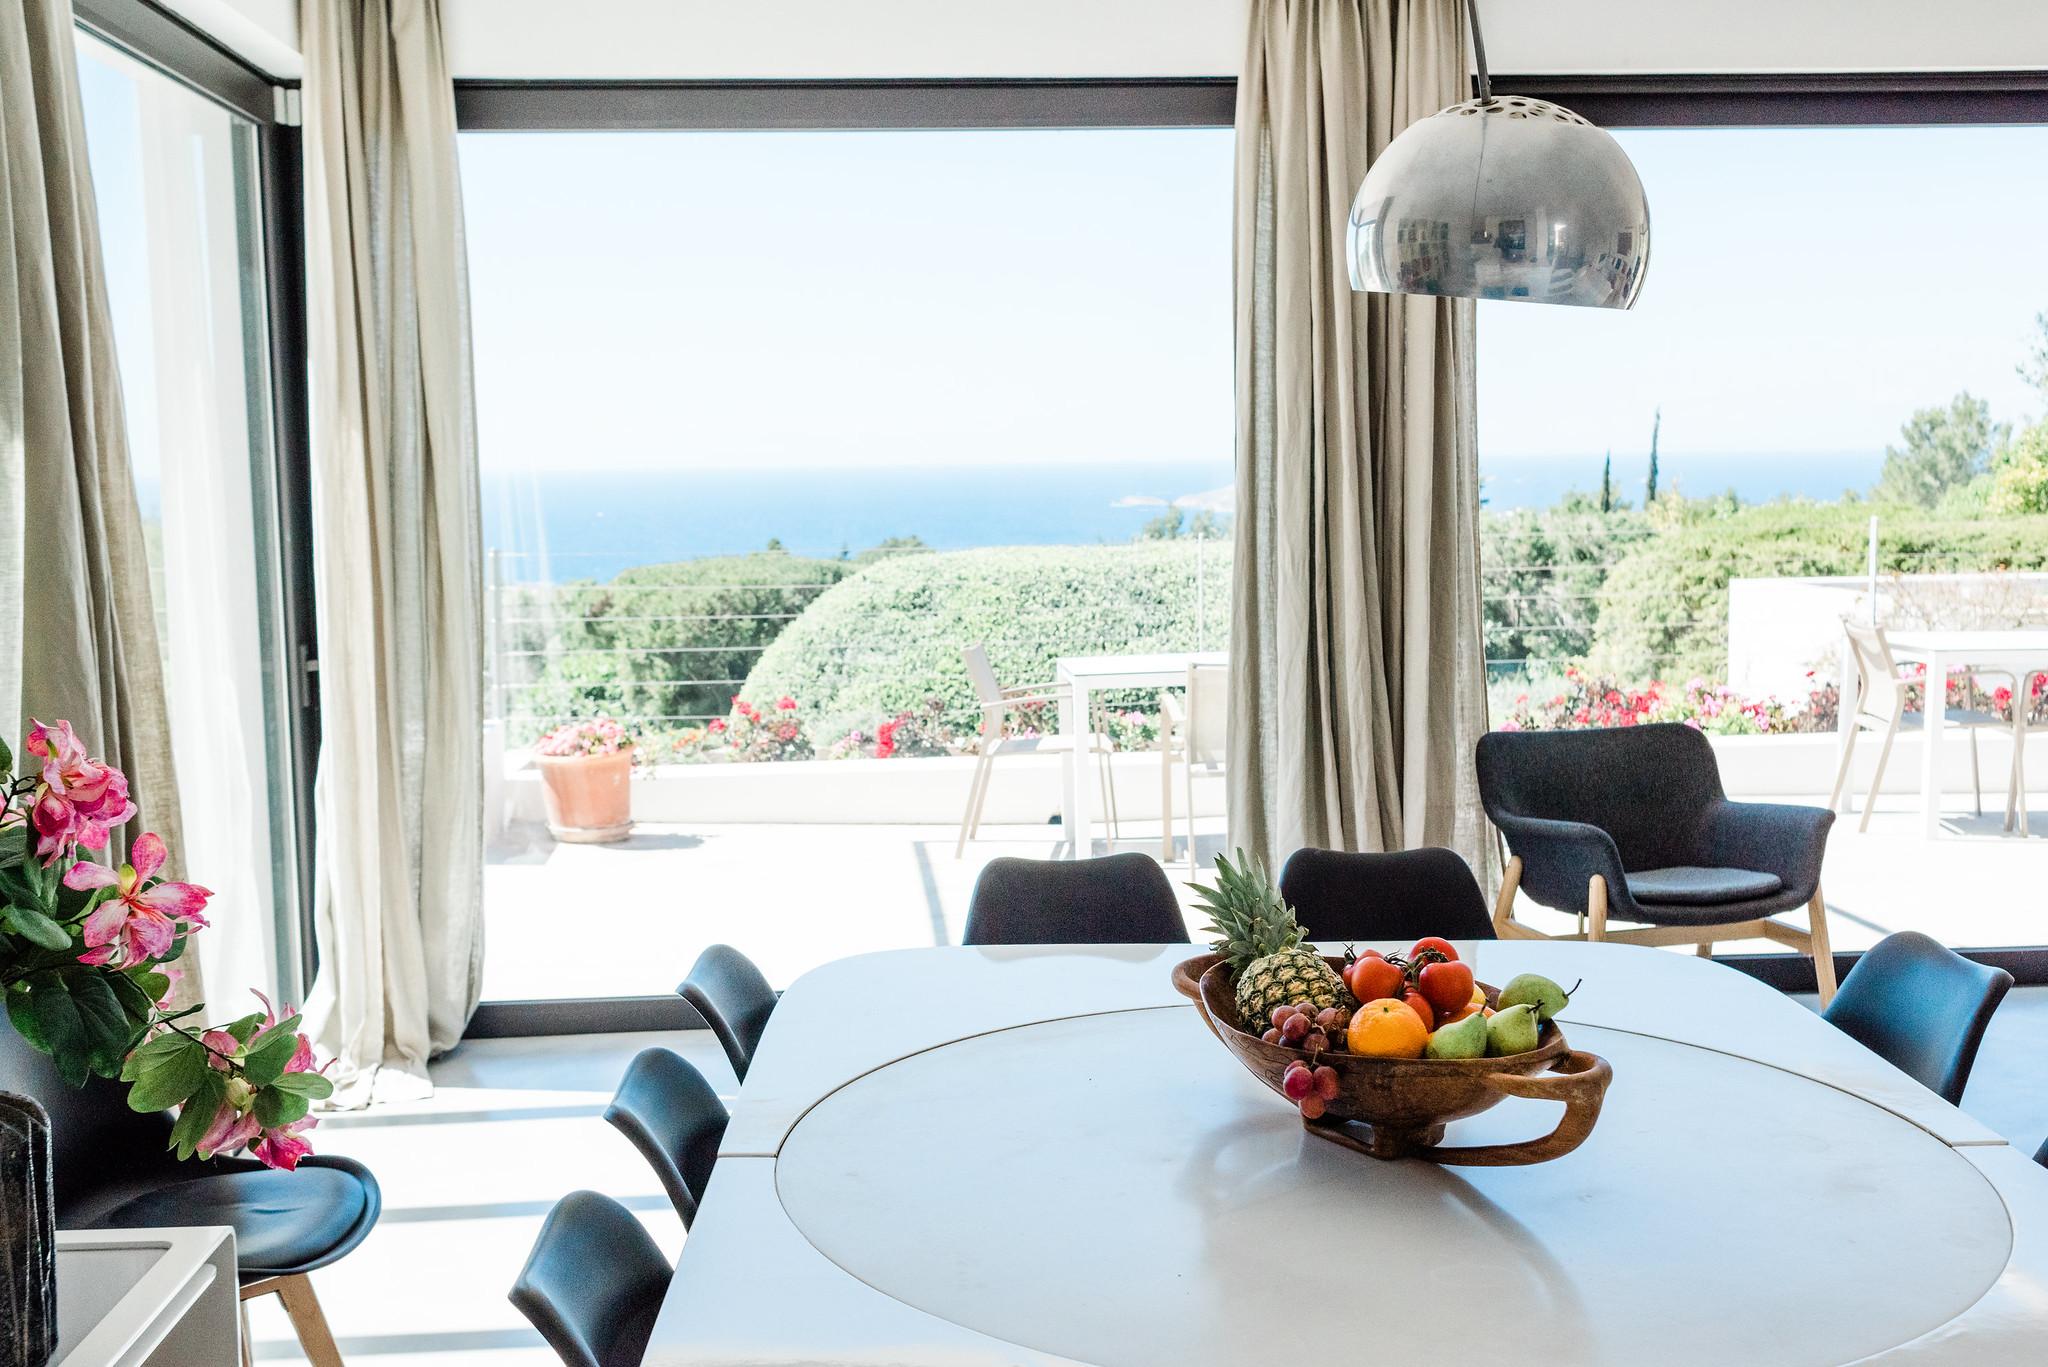 https://www.white-ibiza.com/wp-content/uploads/2020/06/white-ibiza-villas-casa-nyah-interior-dining.jpg